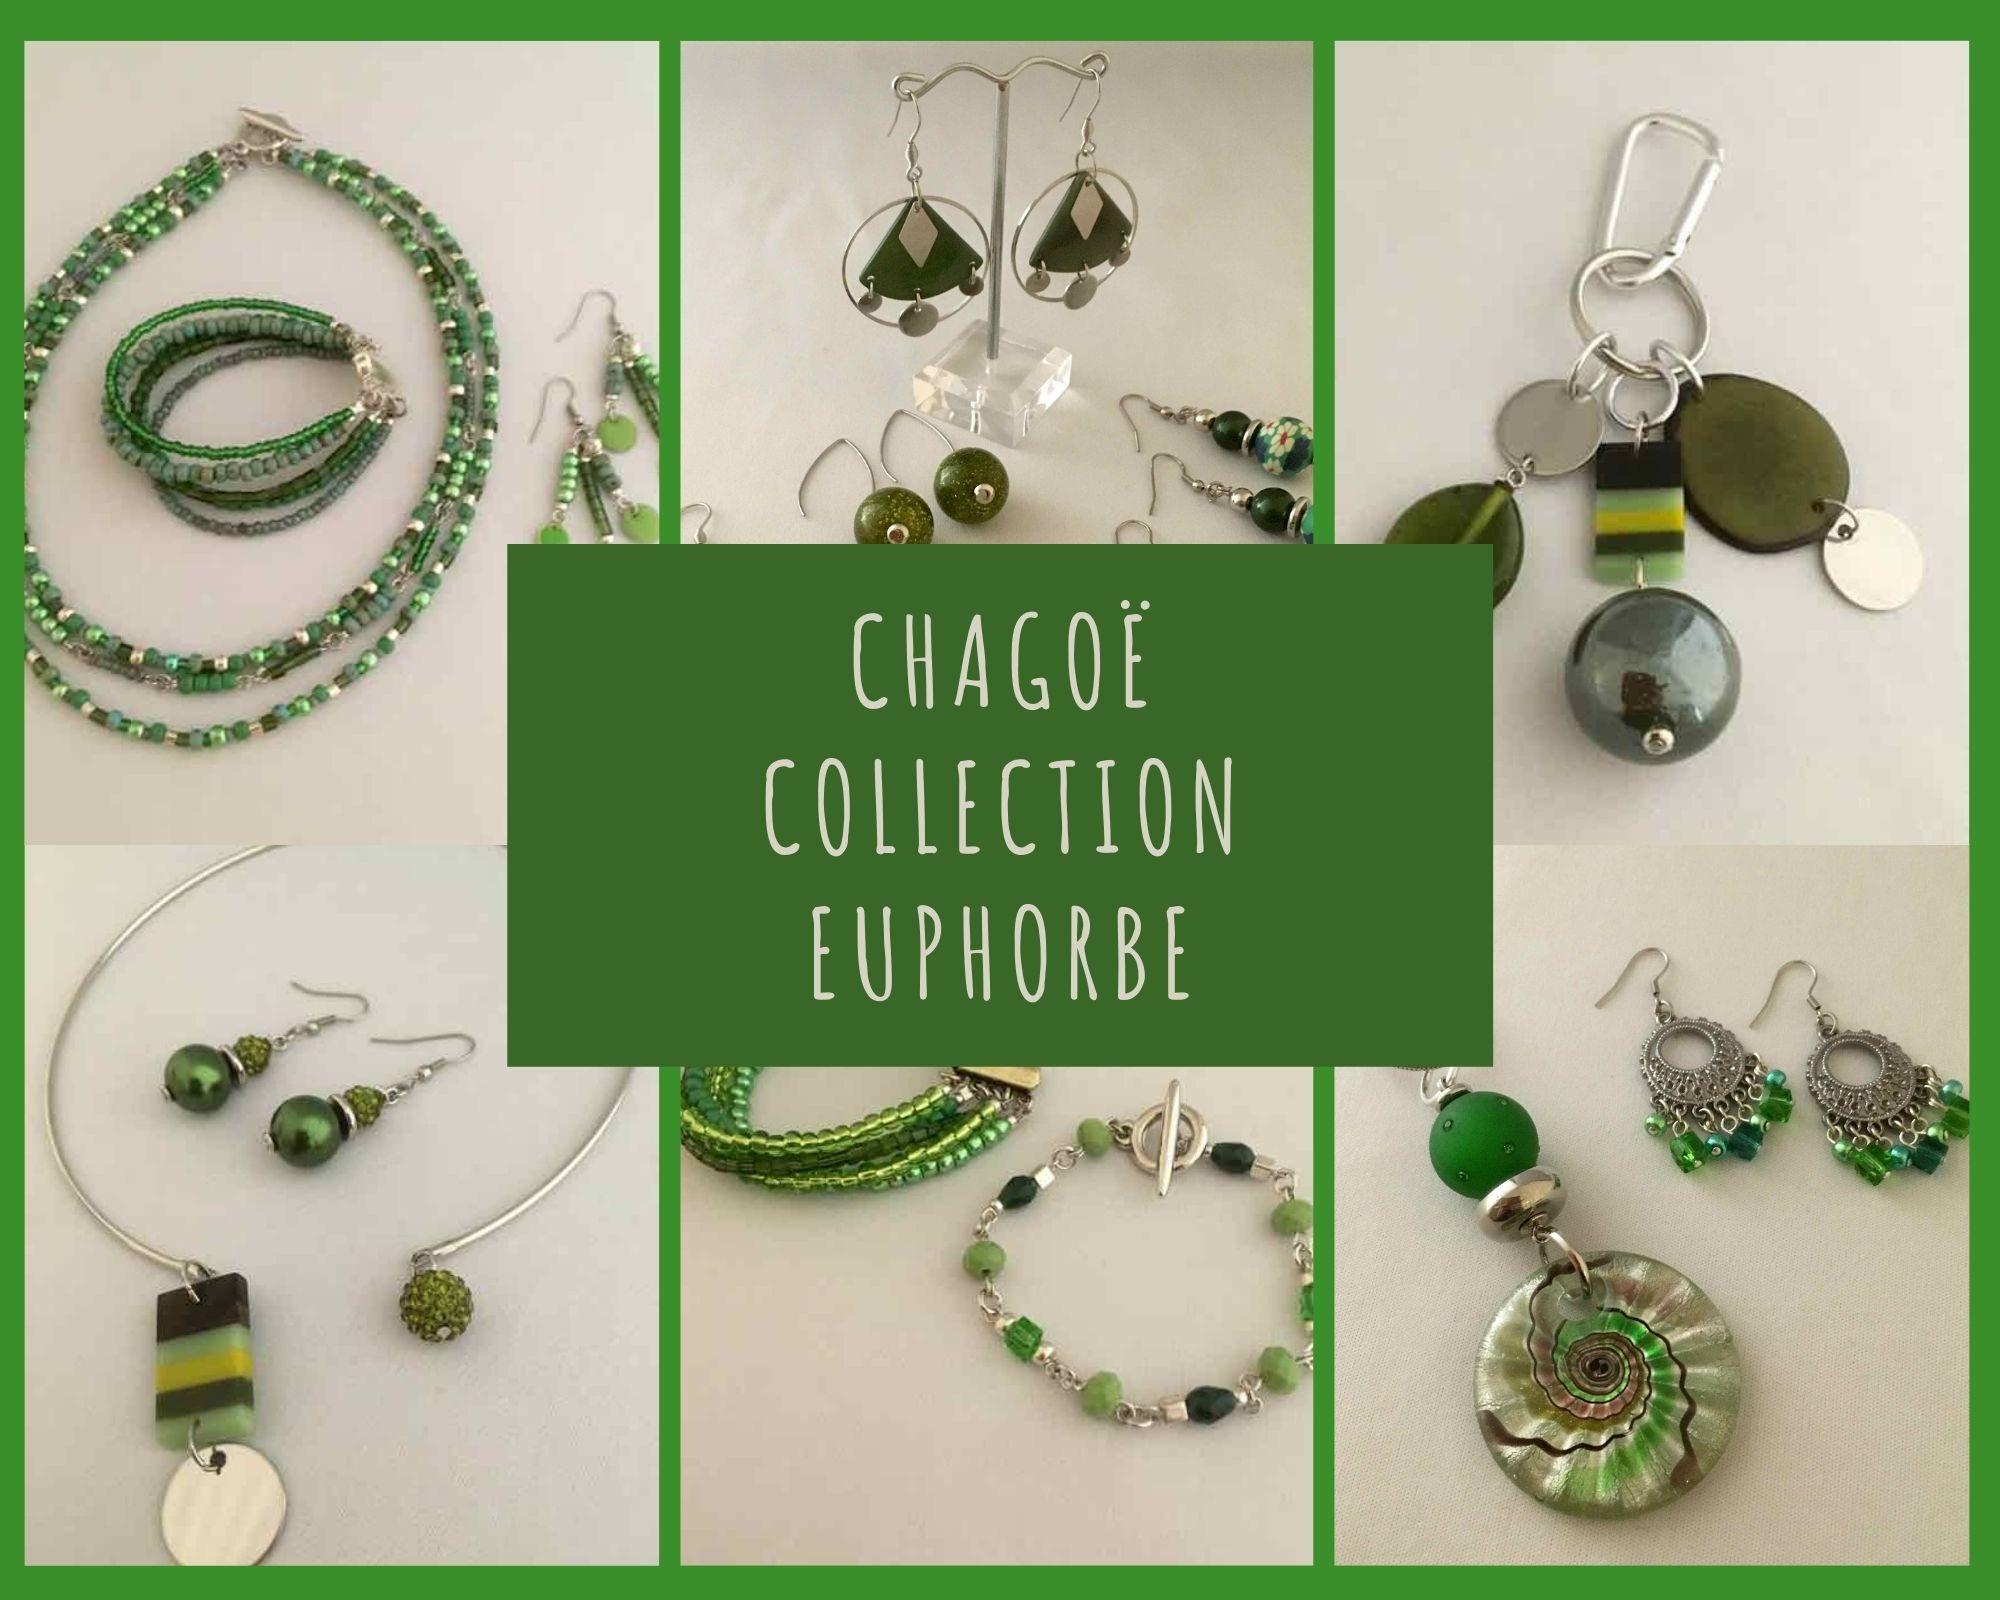 Collection EUPHORBE Chagoë 2021